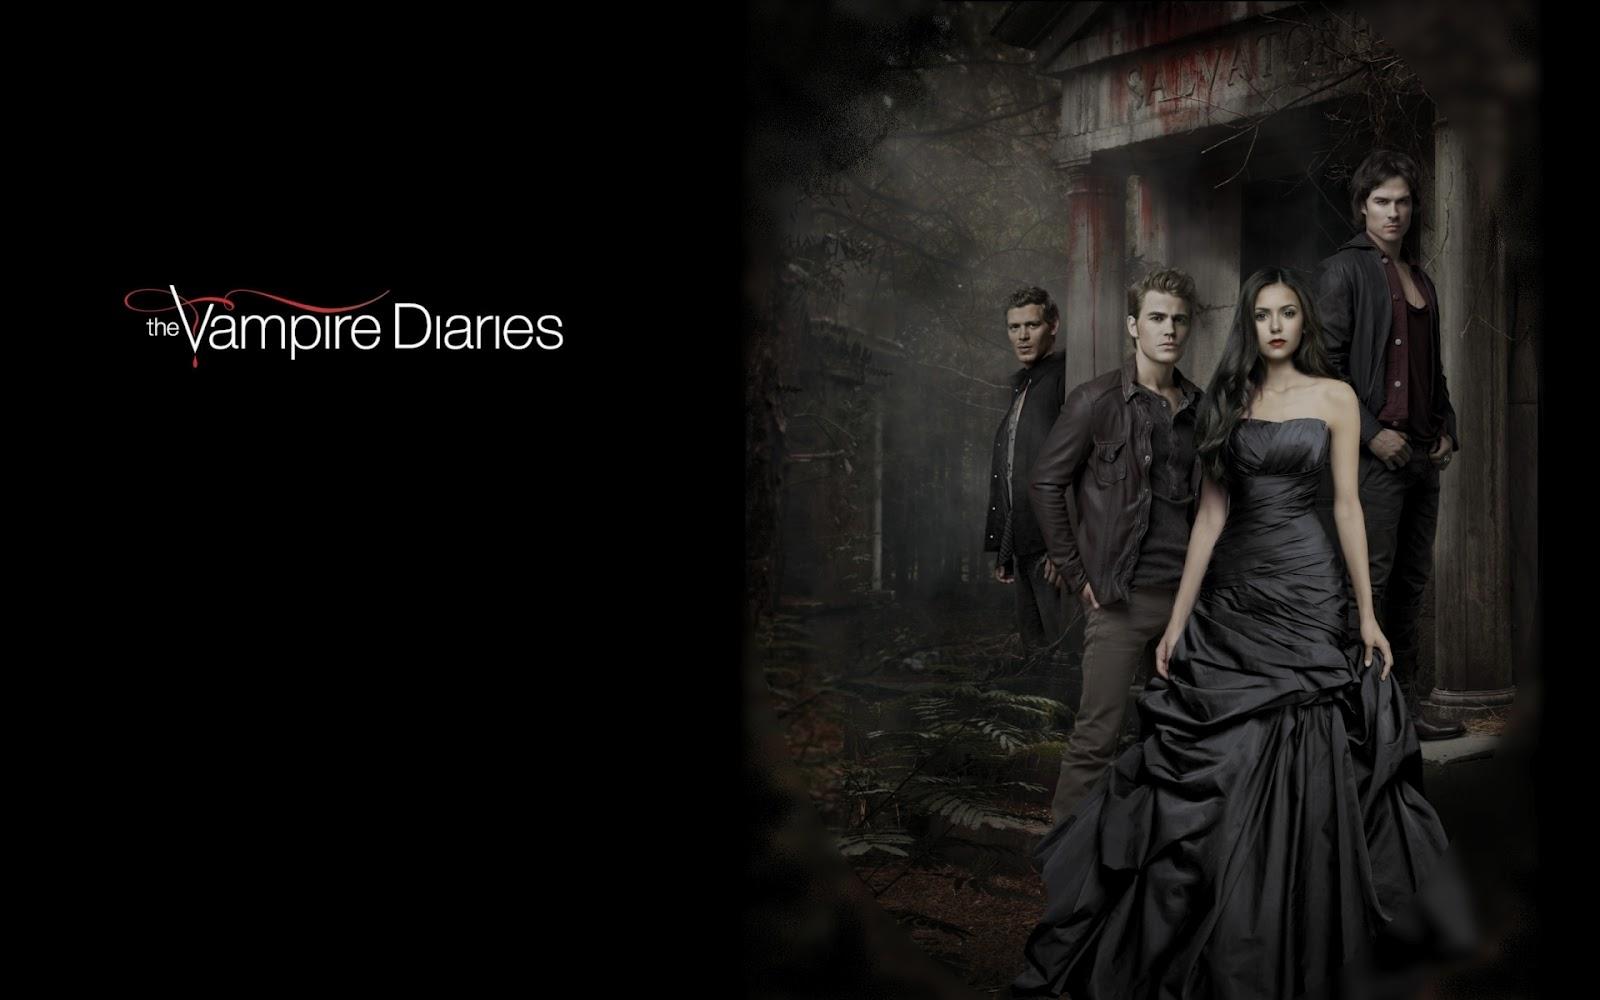 http://3.bp.blogspot.com/-7mIhTjn2b28/T6_CimhwZCI/AAAAAAAALq4/YWVnIsdGO28/s1600/Vampire_Diaries_Wallpaper_TV_1920x1200.jpg